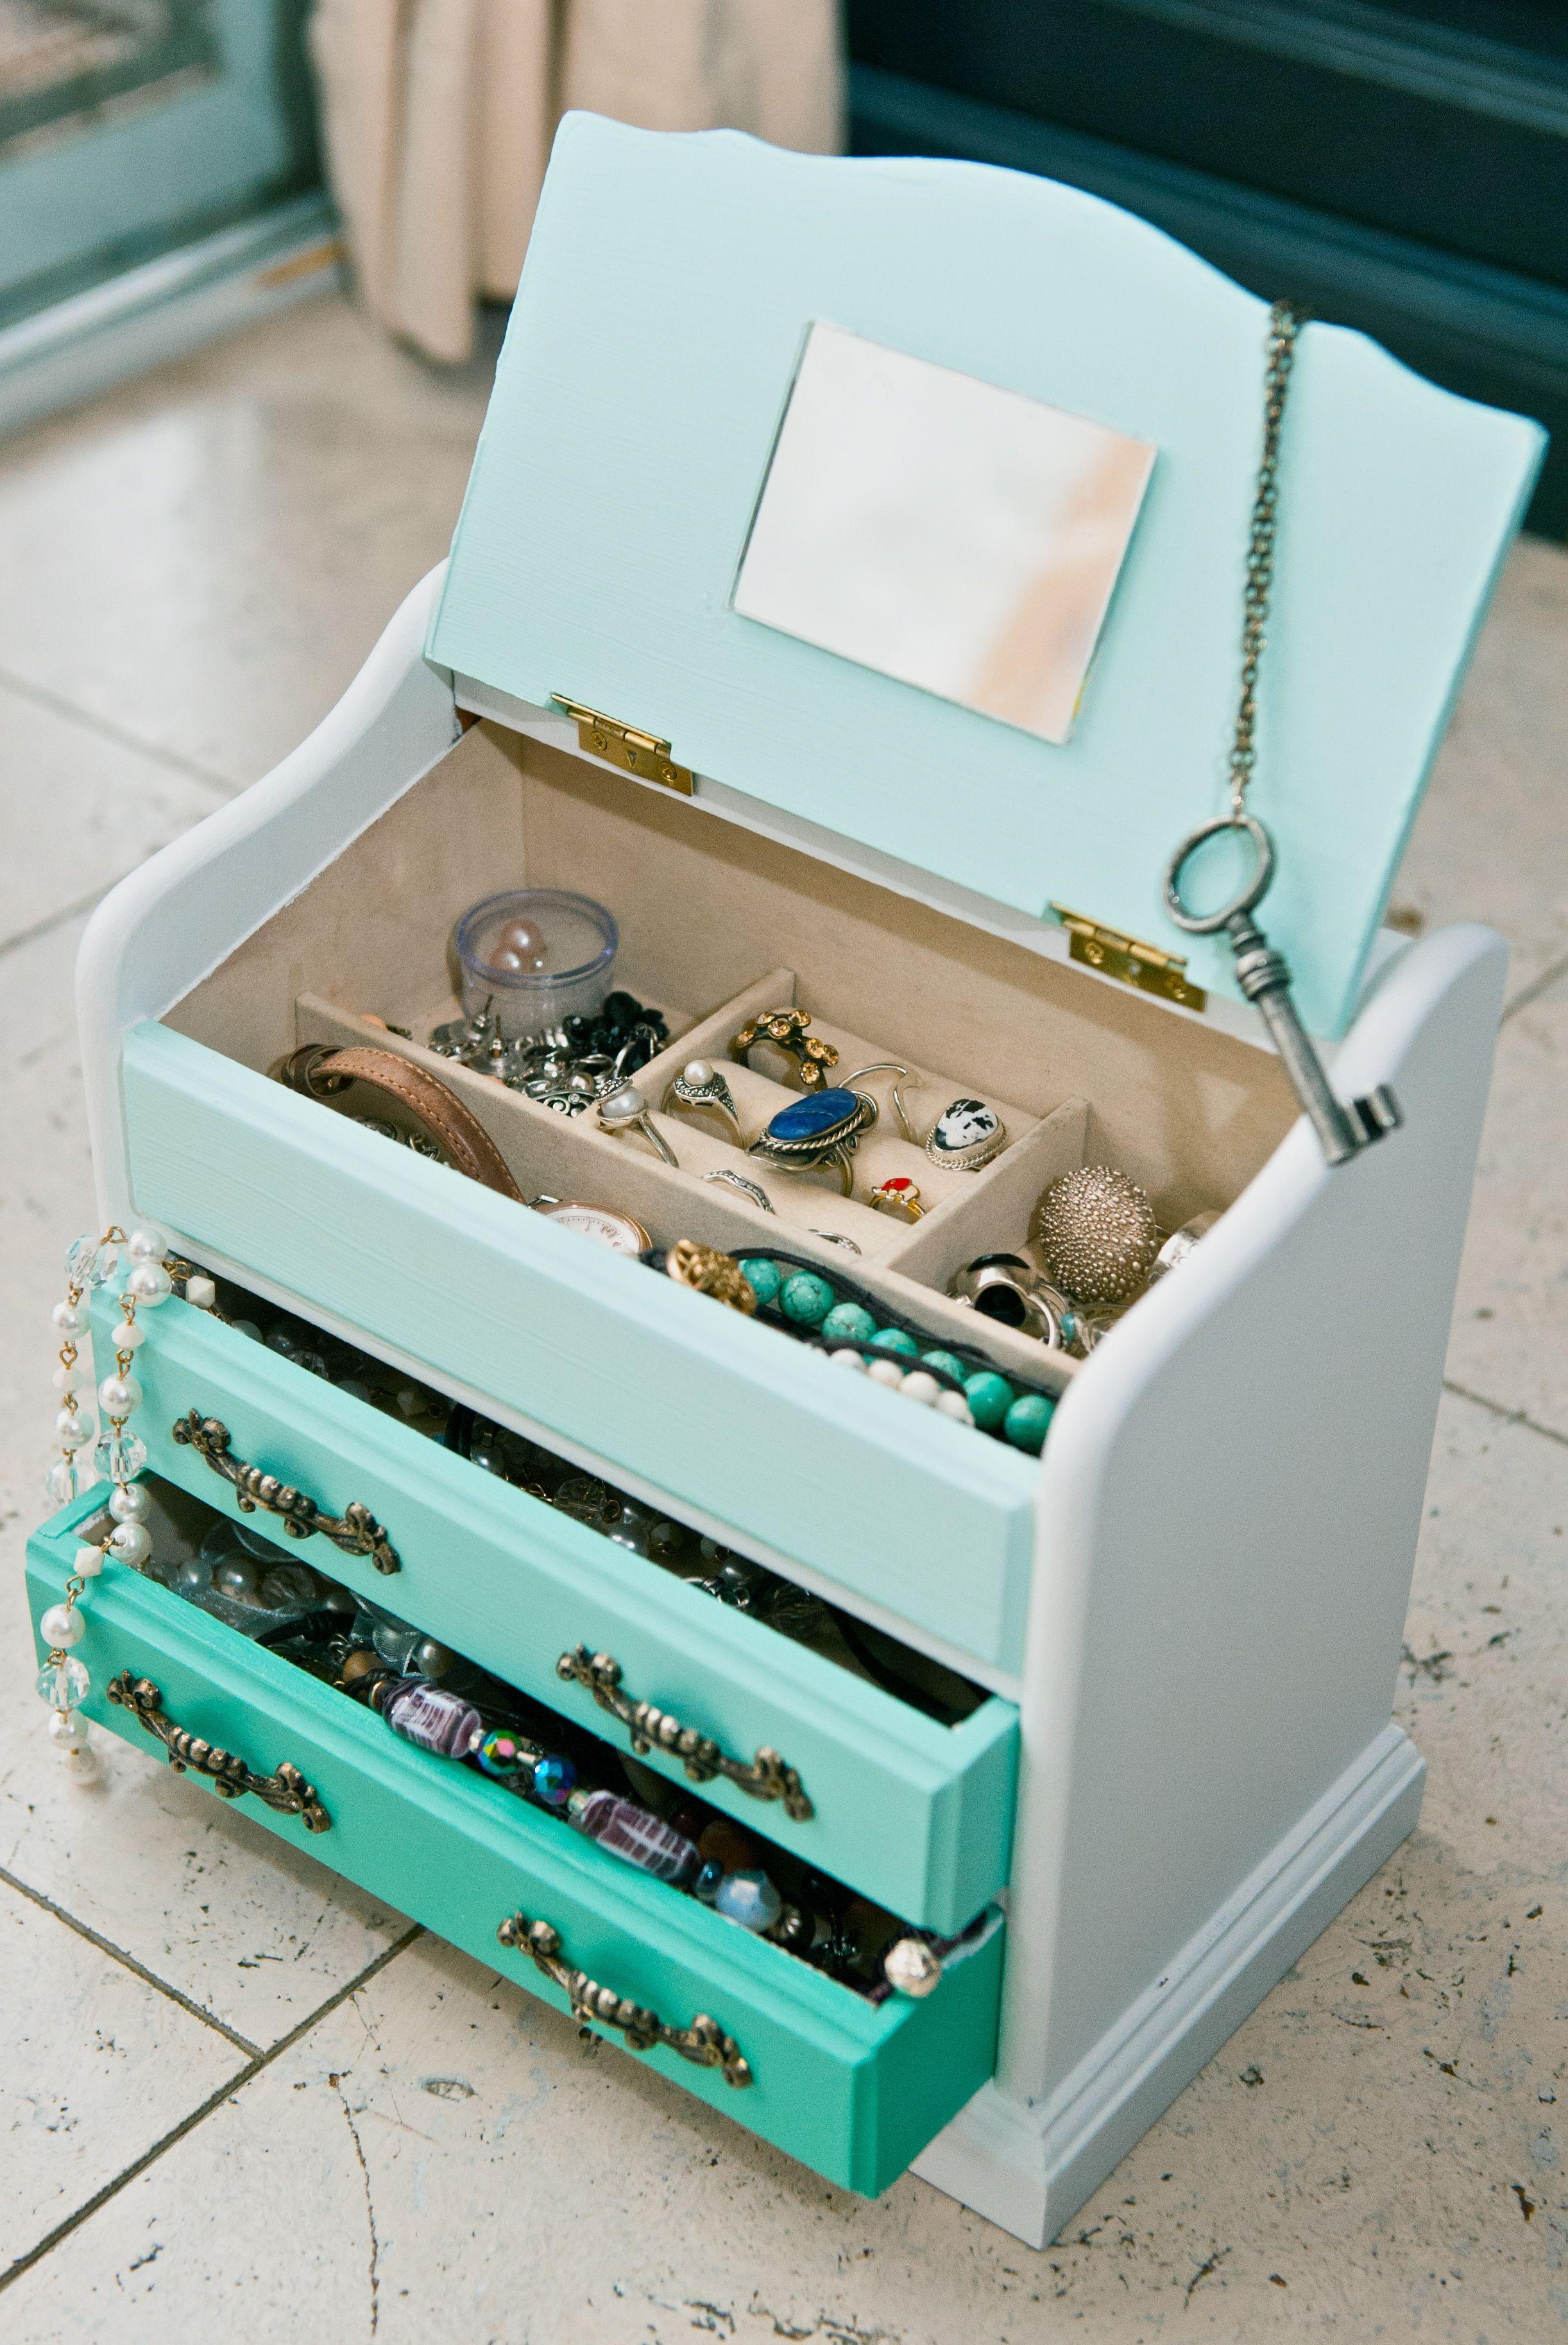 Diy jewelry box diy home decor projects jewerly box diy